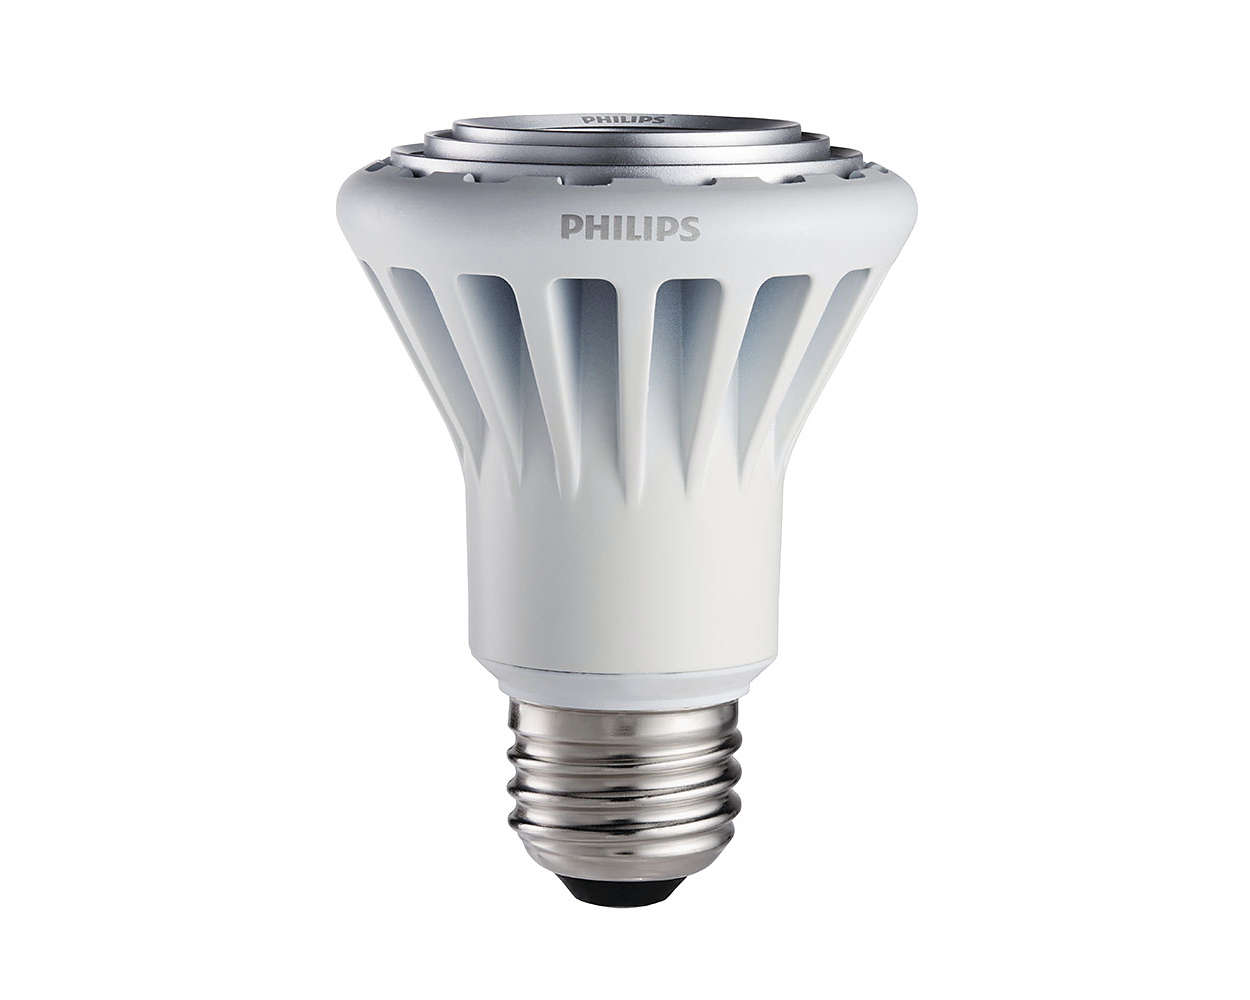 Energy Saving Floodlights : Buy the philips ambientled energy saving indoor flood